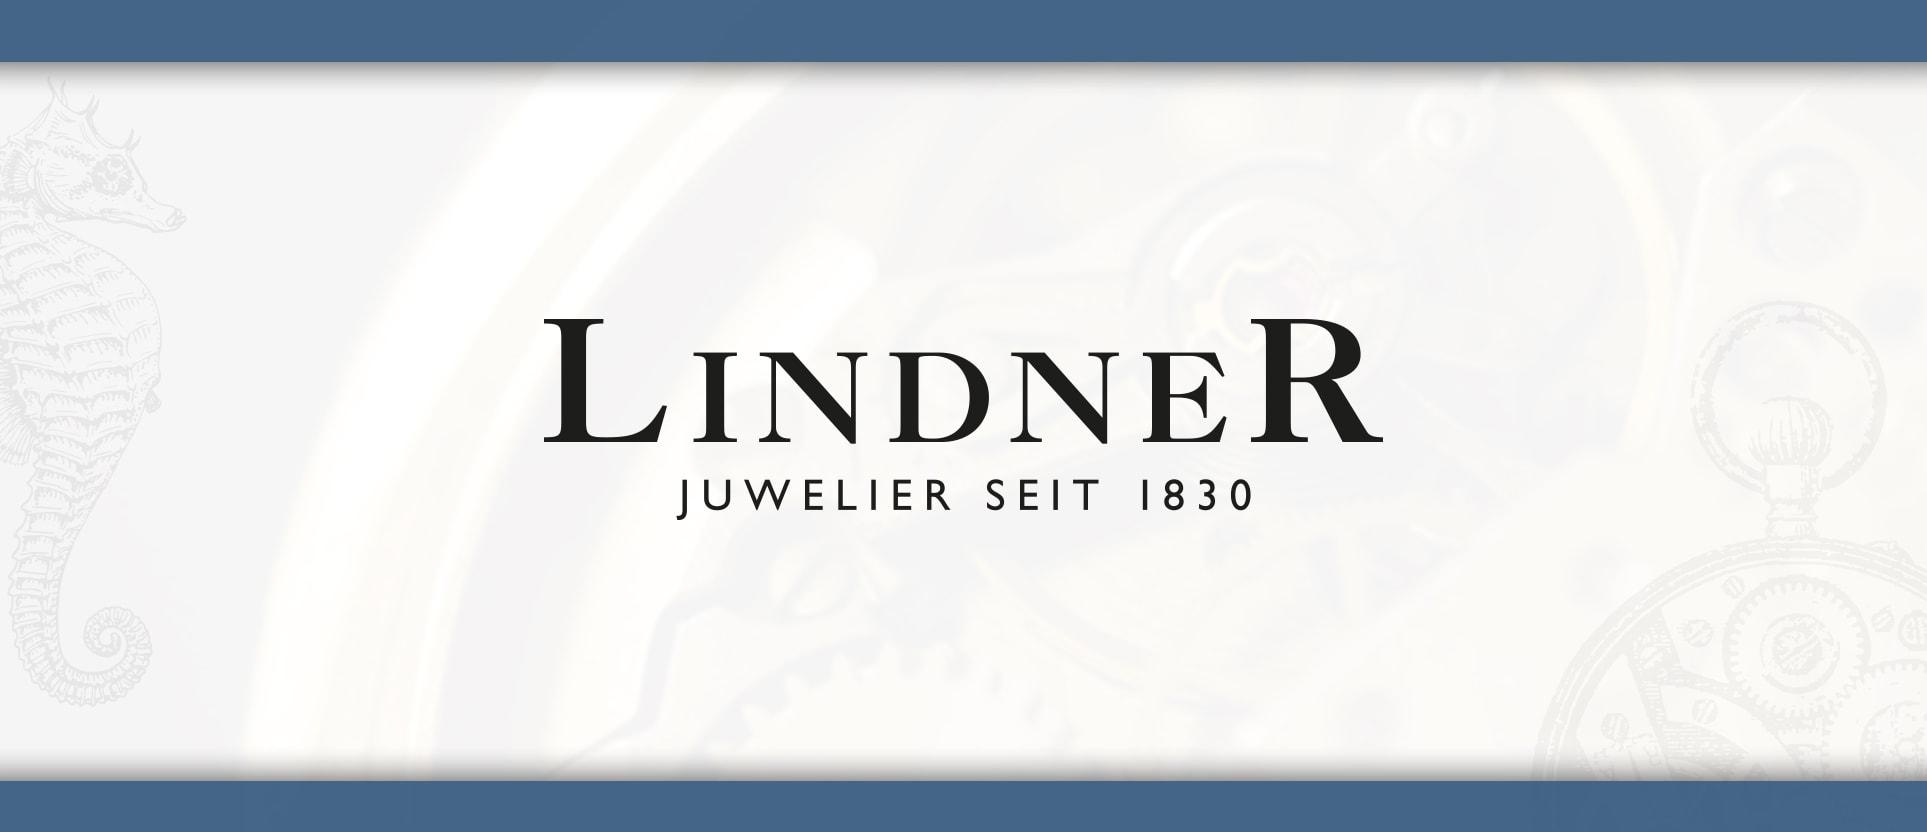 Juwelier Lindner Firmenlogo | Delphos Technische Kriminalprävention